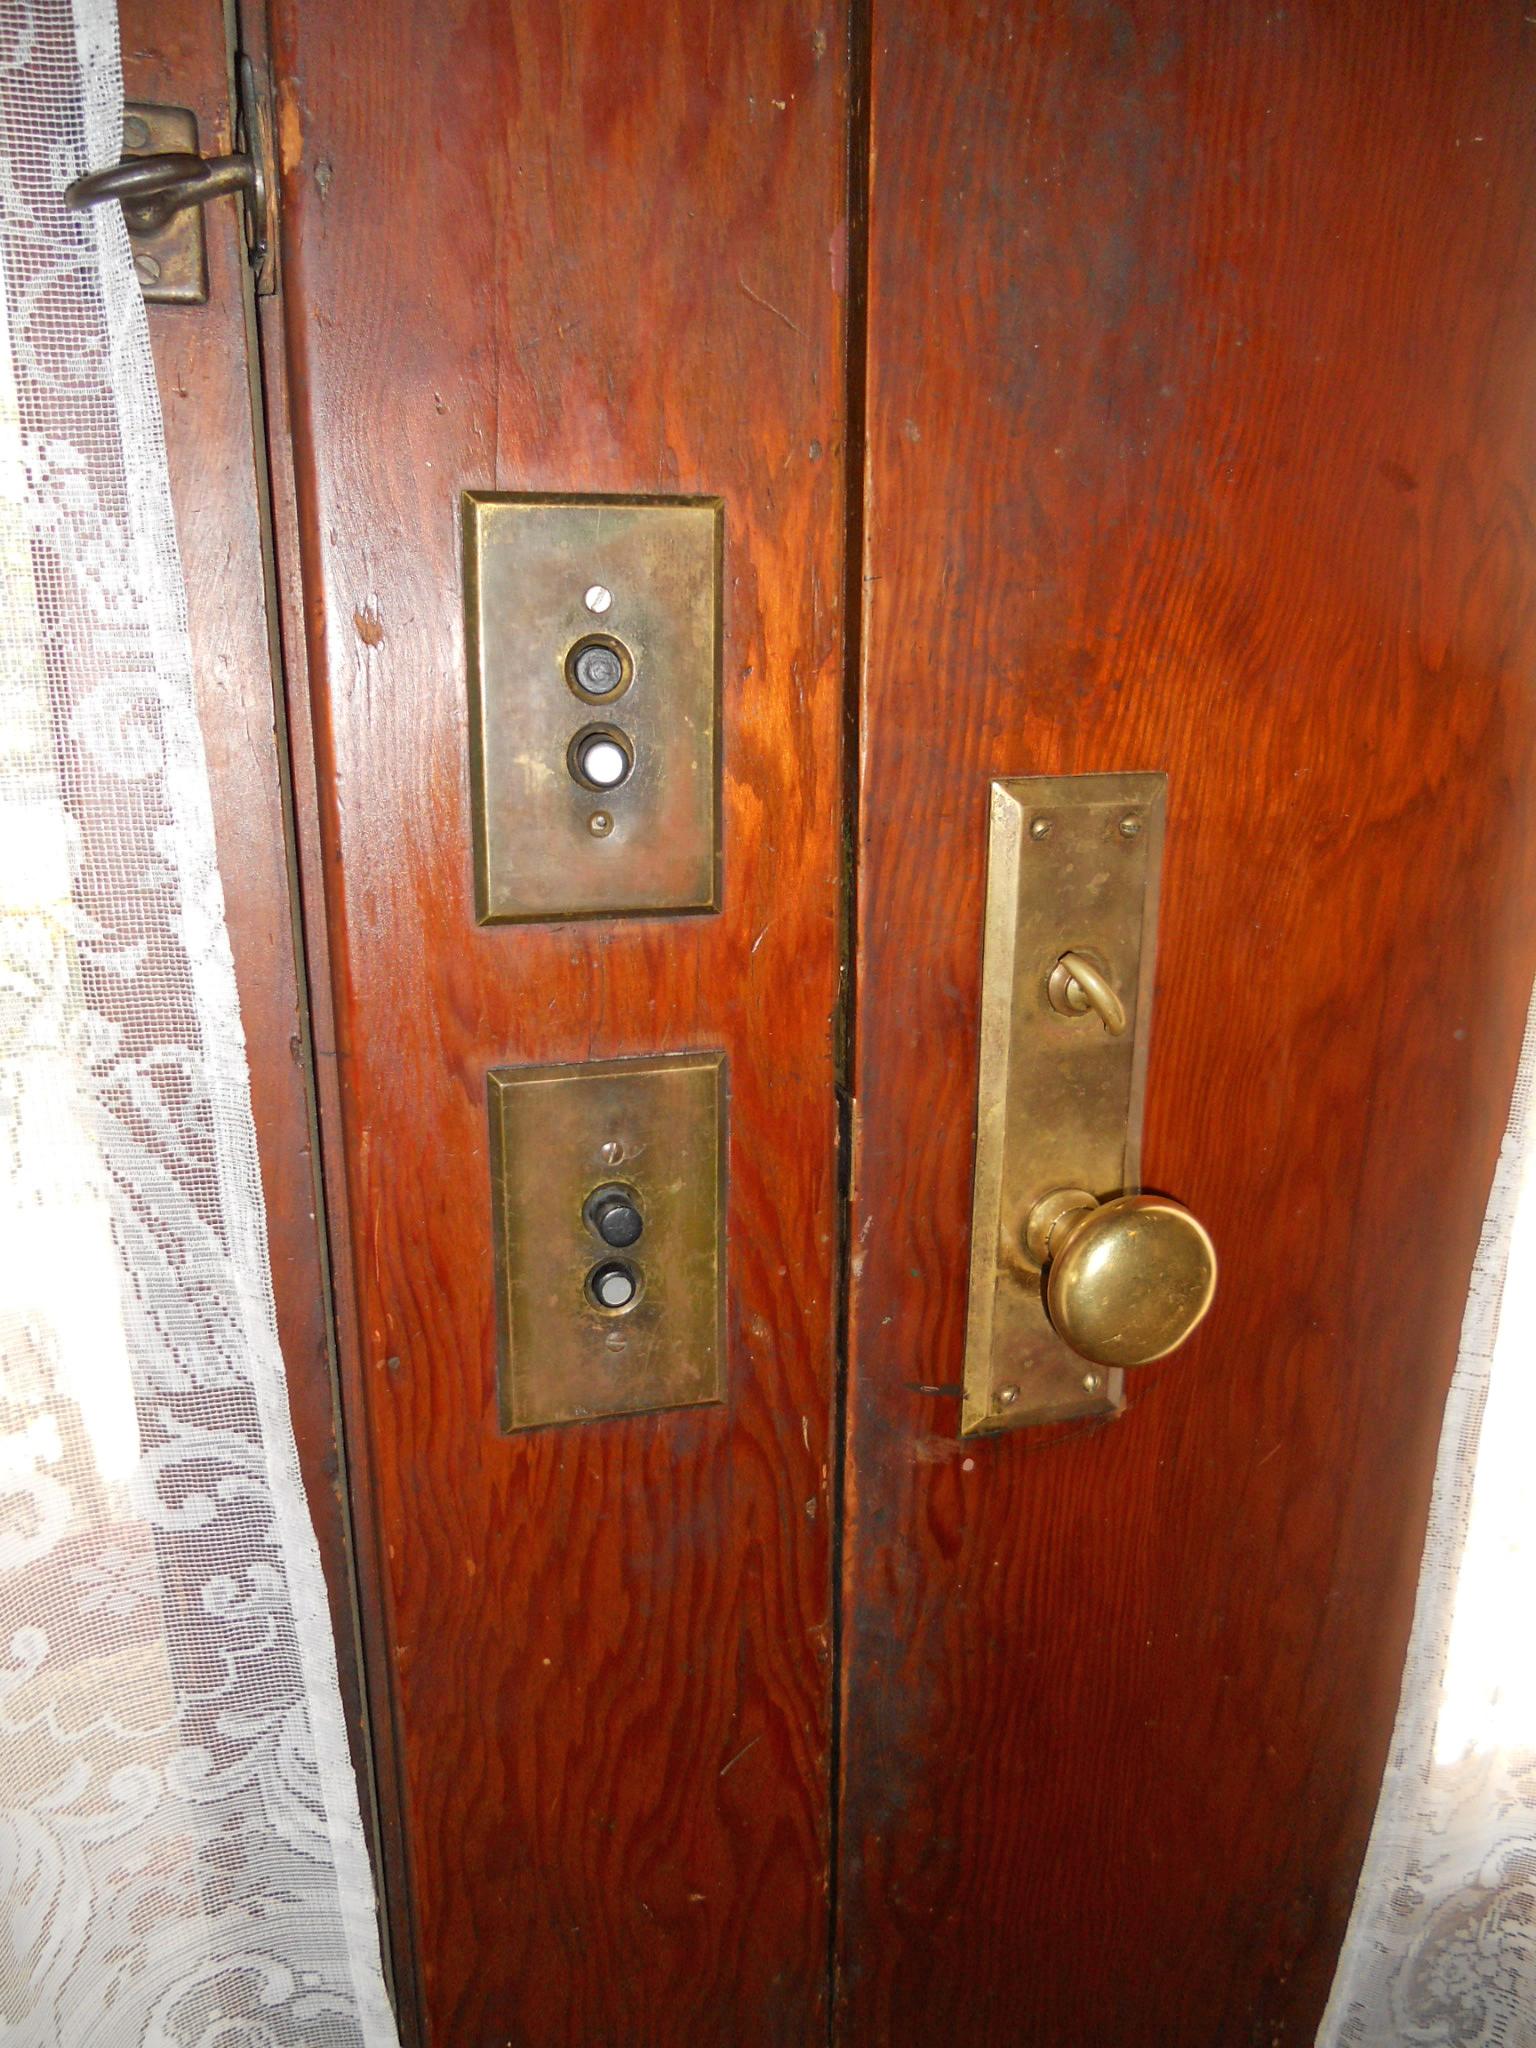 Original push-button lite switches next to front door.